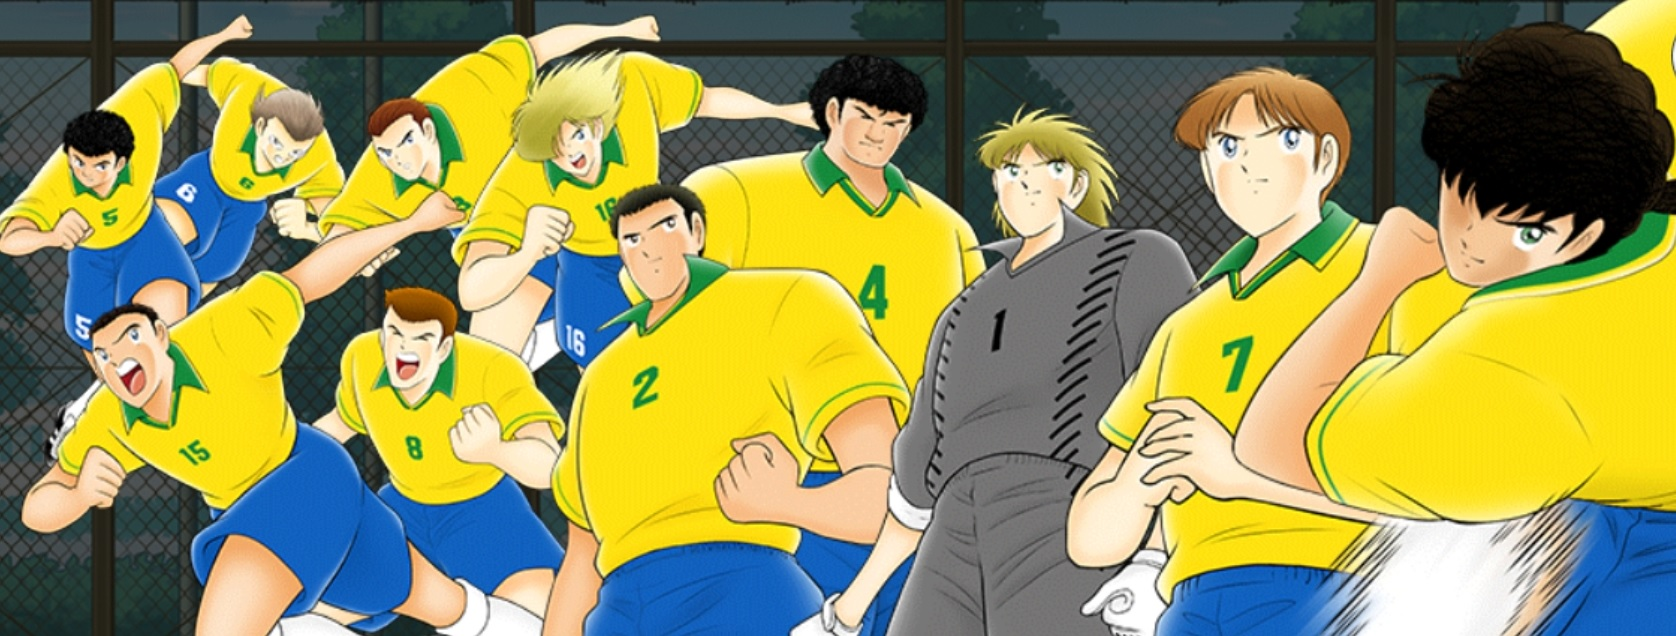 Captain Tsubasa - Nazionale Brasile